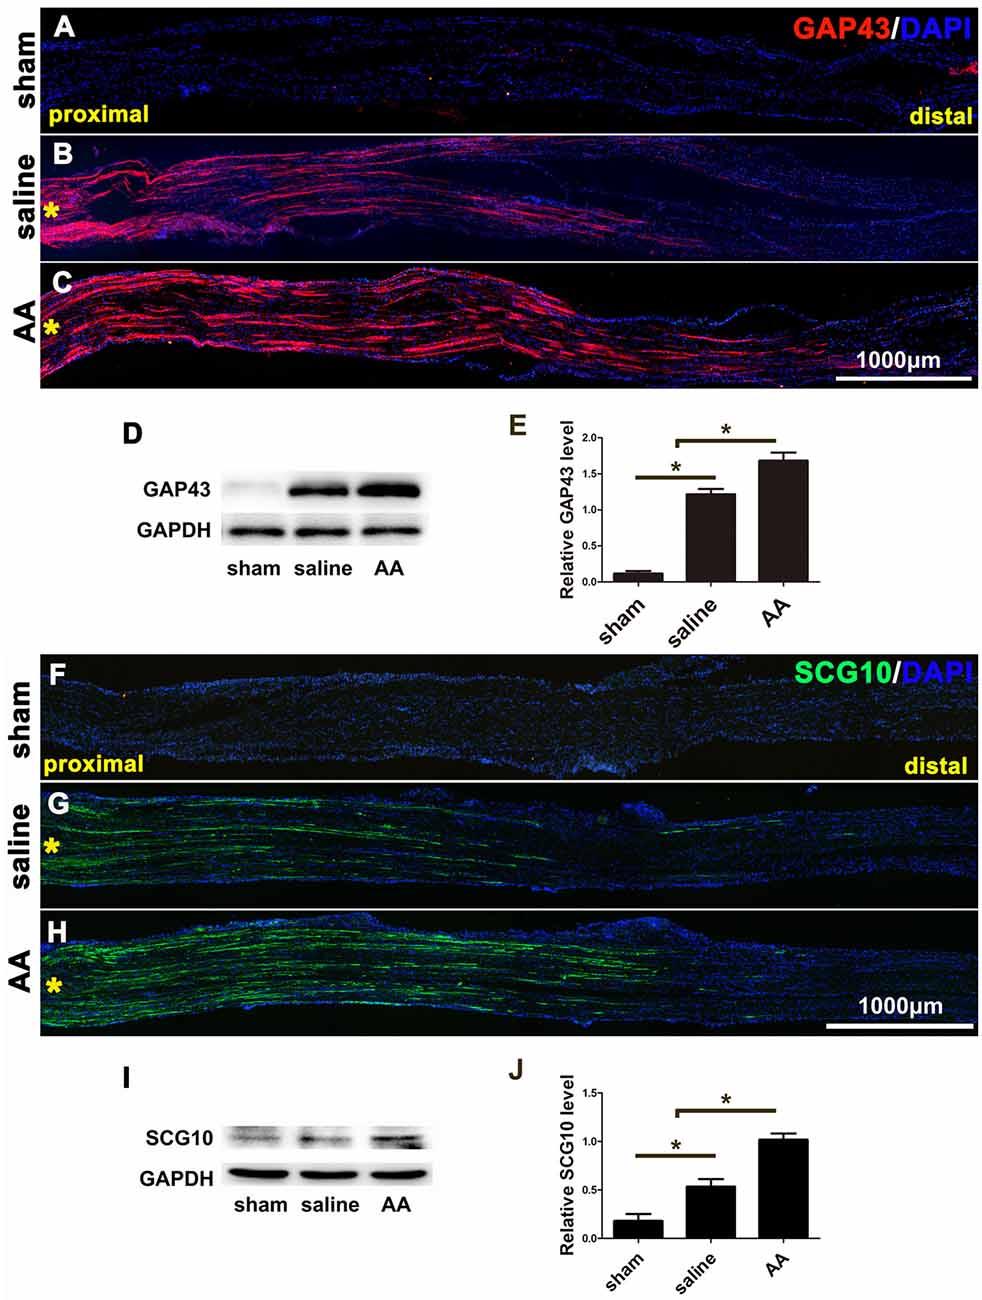 Frontiers | Ascorbic Acid Facilitates Neural Regeneration After